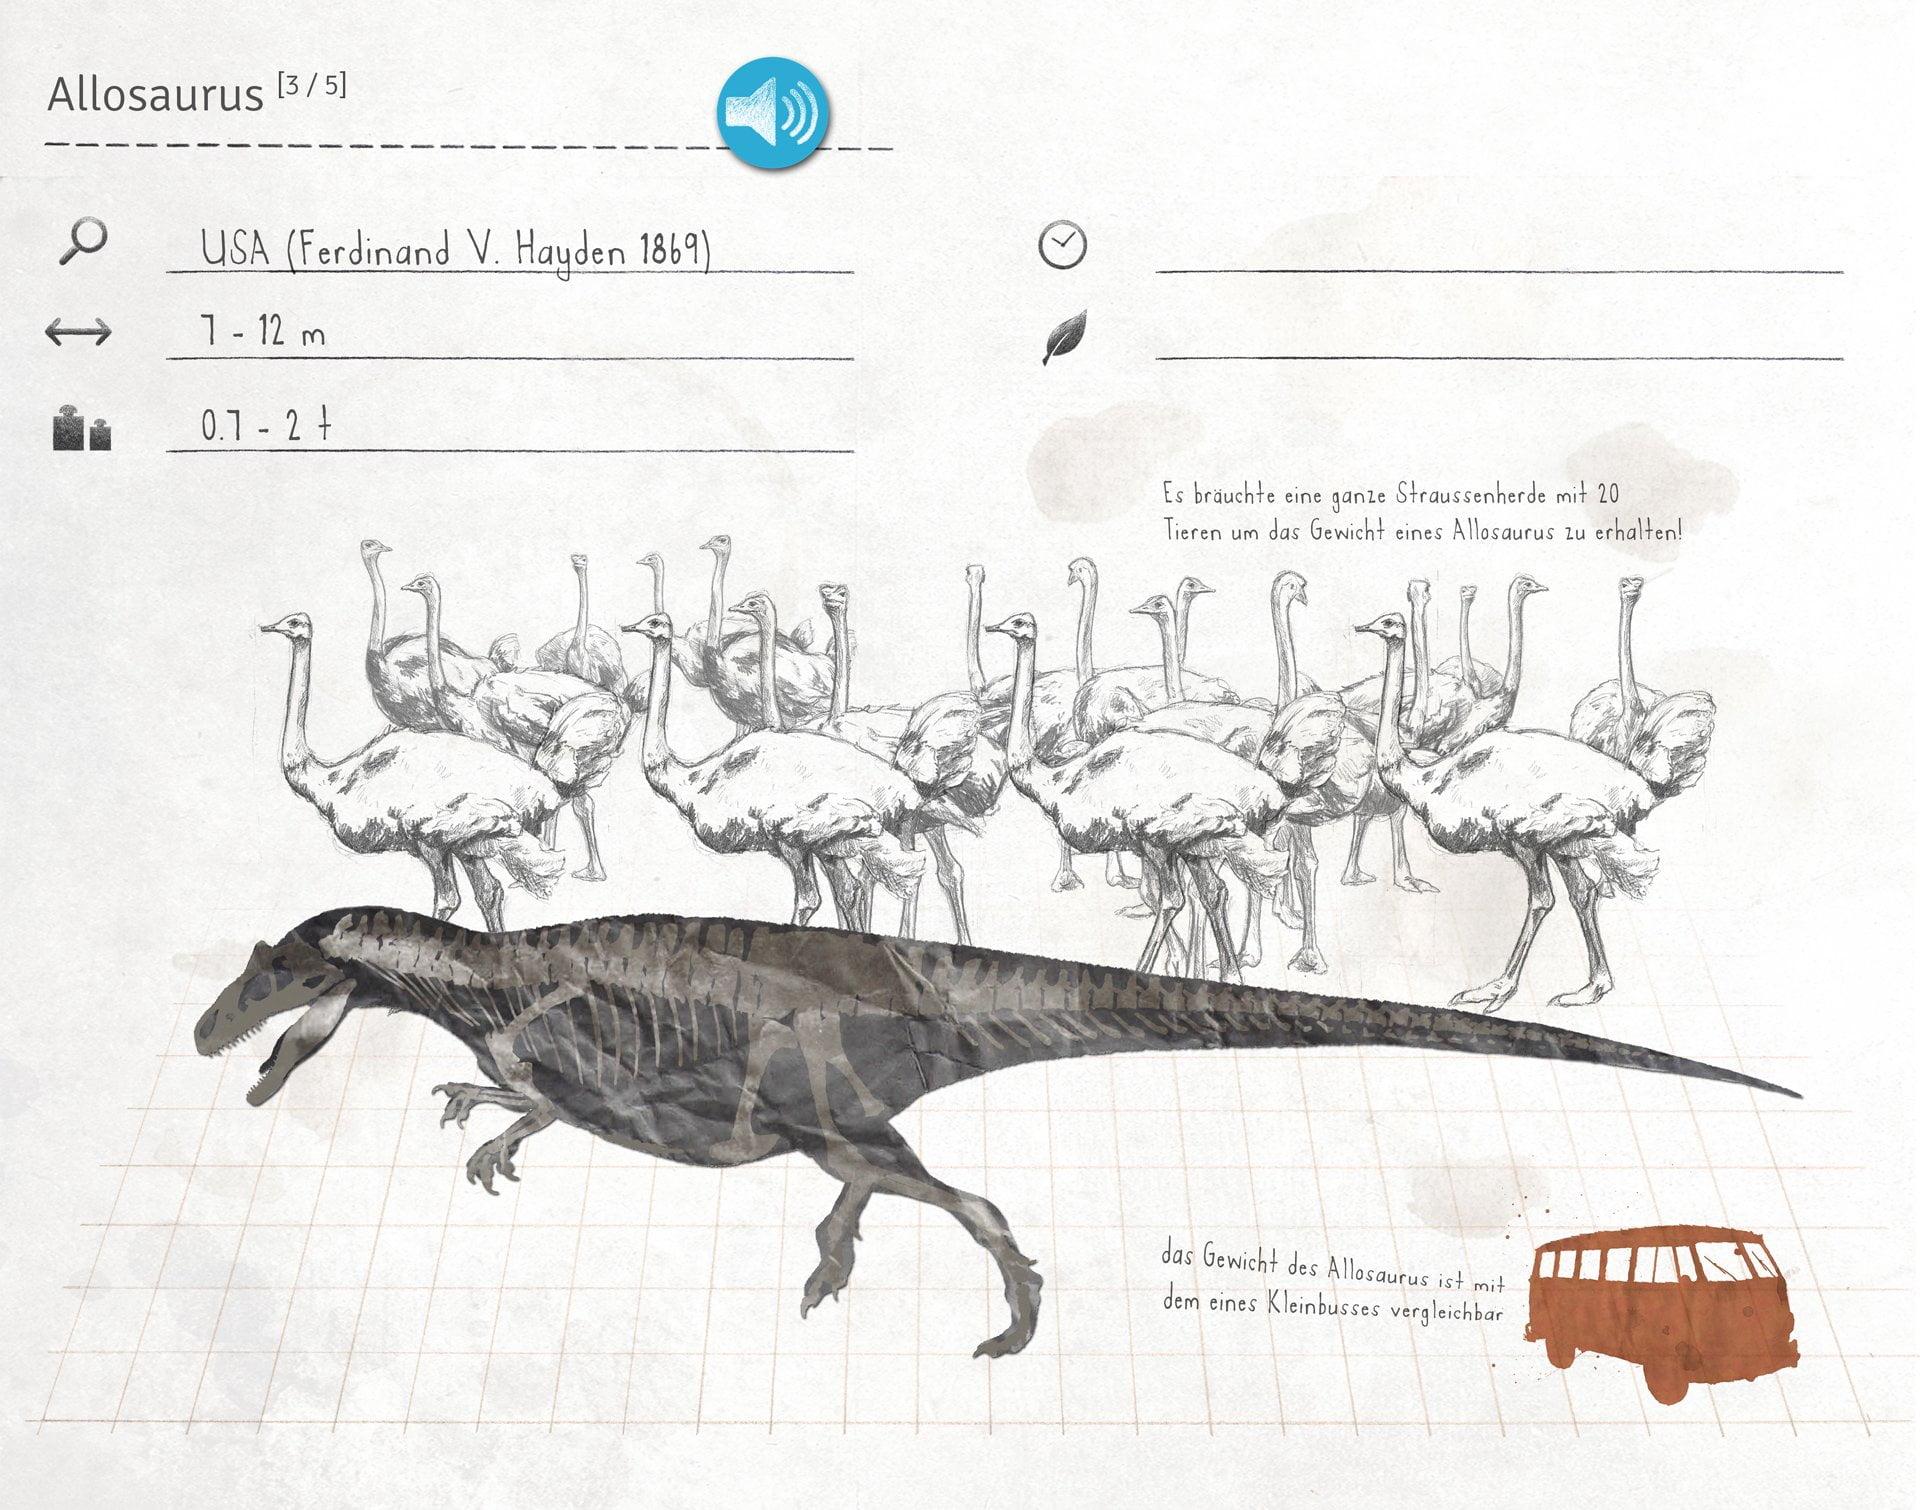 Paléoskop, digitales Skizzenbuch, Allosaurus, ikonaut